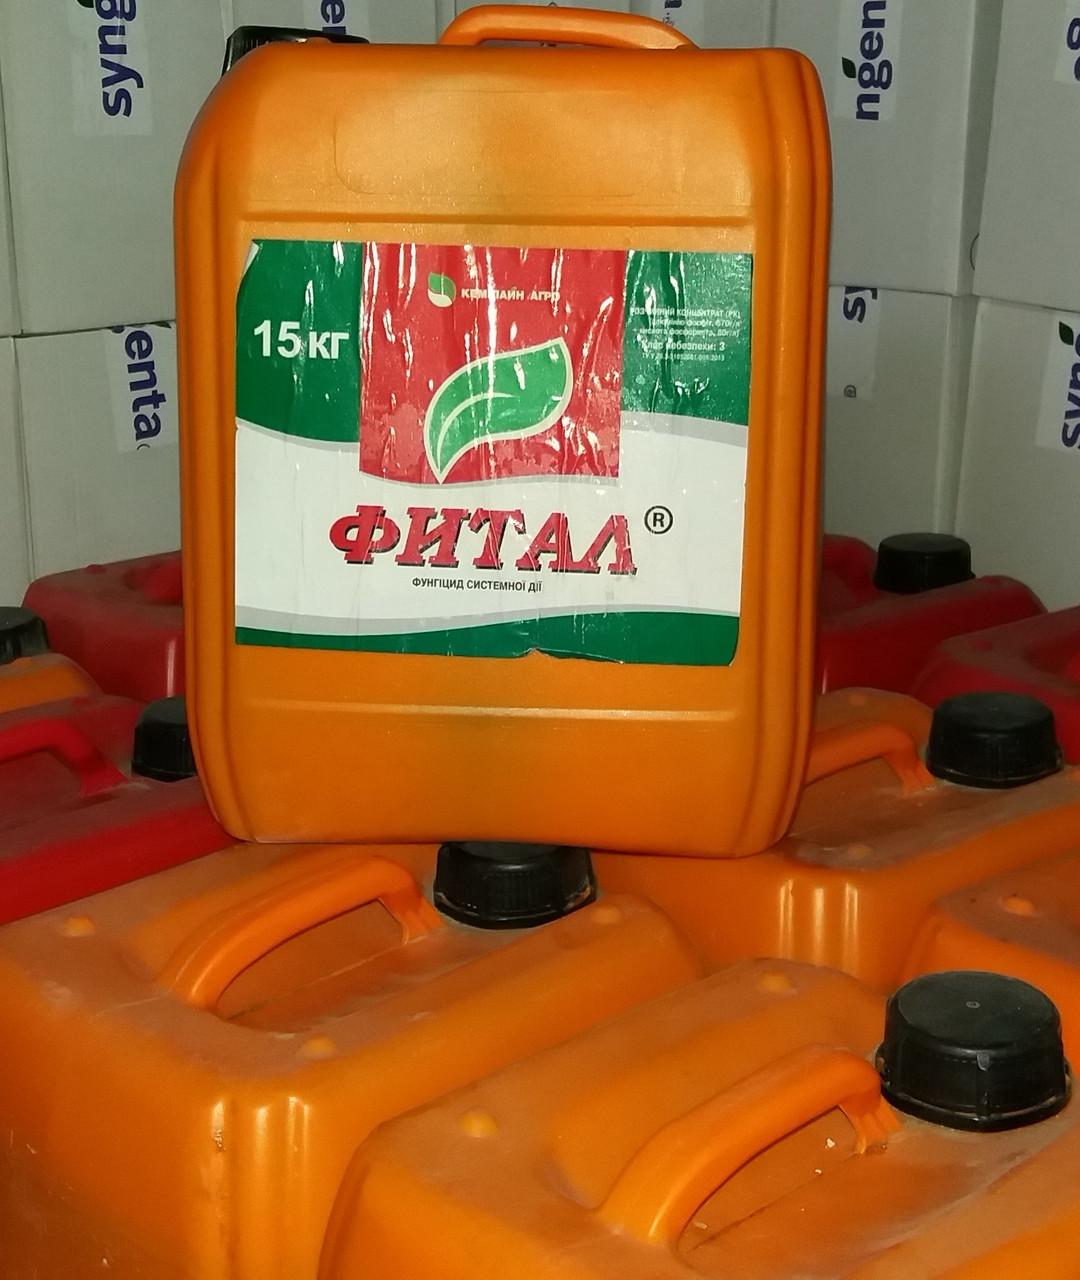 Фитал 65% РК ( фосфо алюмінію, 570 г/кг+фосфориста кислота 80 г/кг )